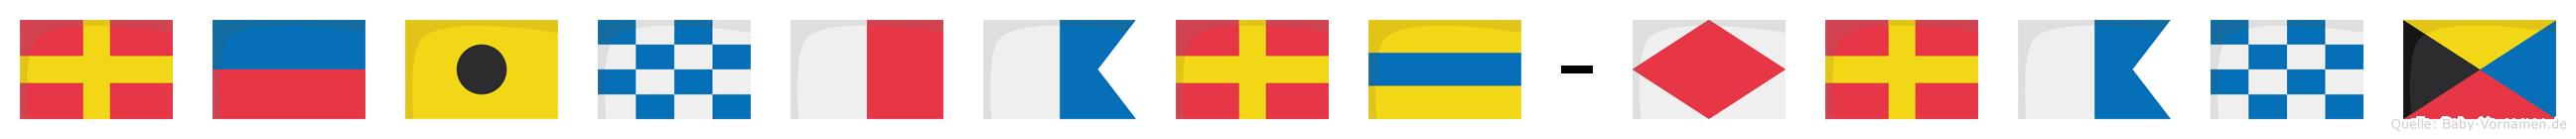 Reinhard-Franz im Flaggenalphabet